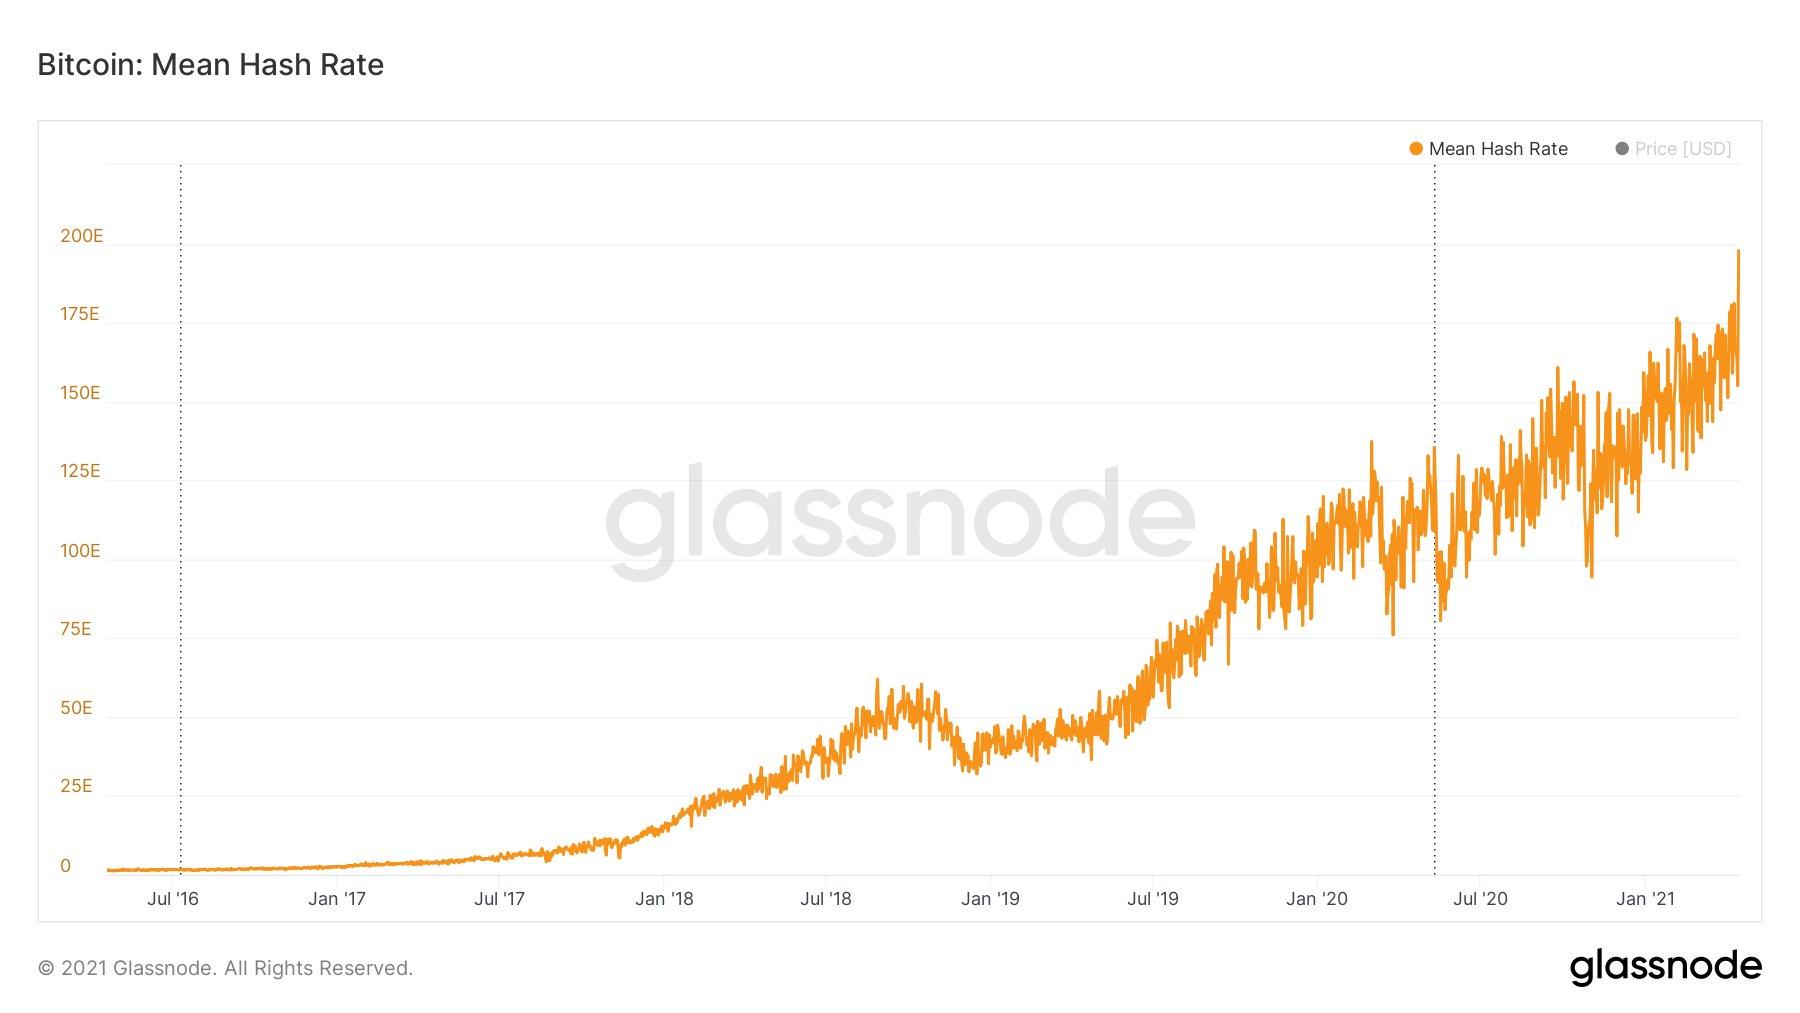 Новый рекорд от биткоина: Хешрейт сети достиг 200 EH/s